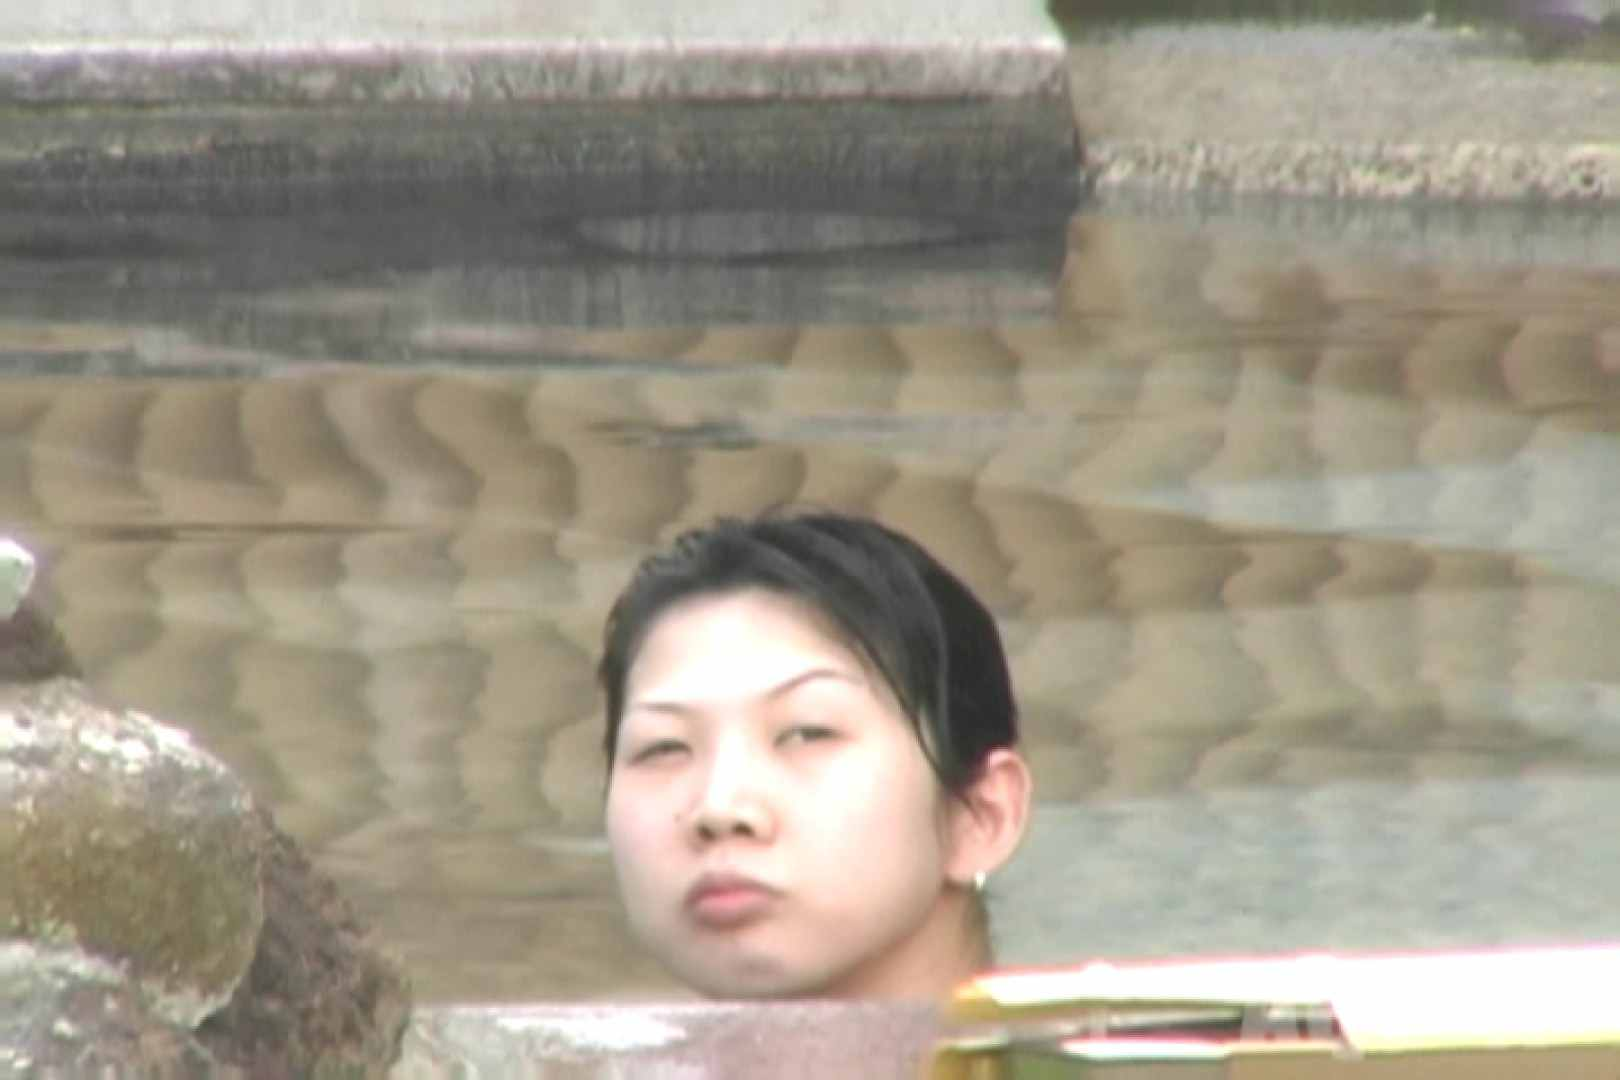 Aquaな露天風呂Vol.850 露天風呂突入 | 盗撮師作品  73pic 55